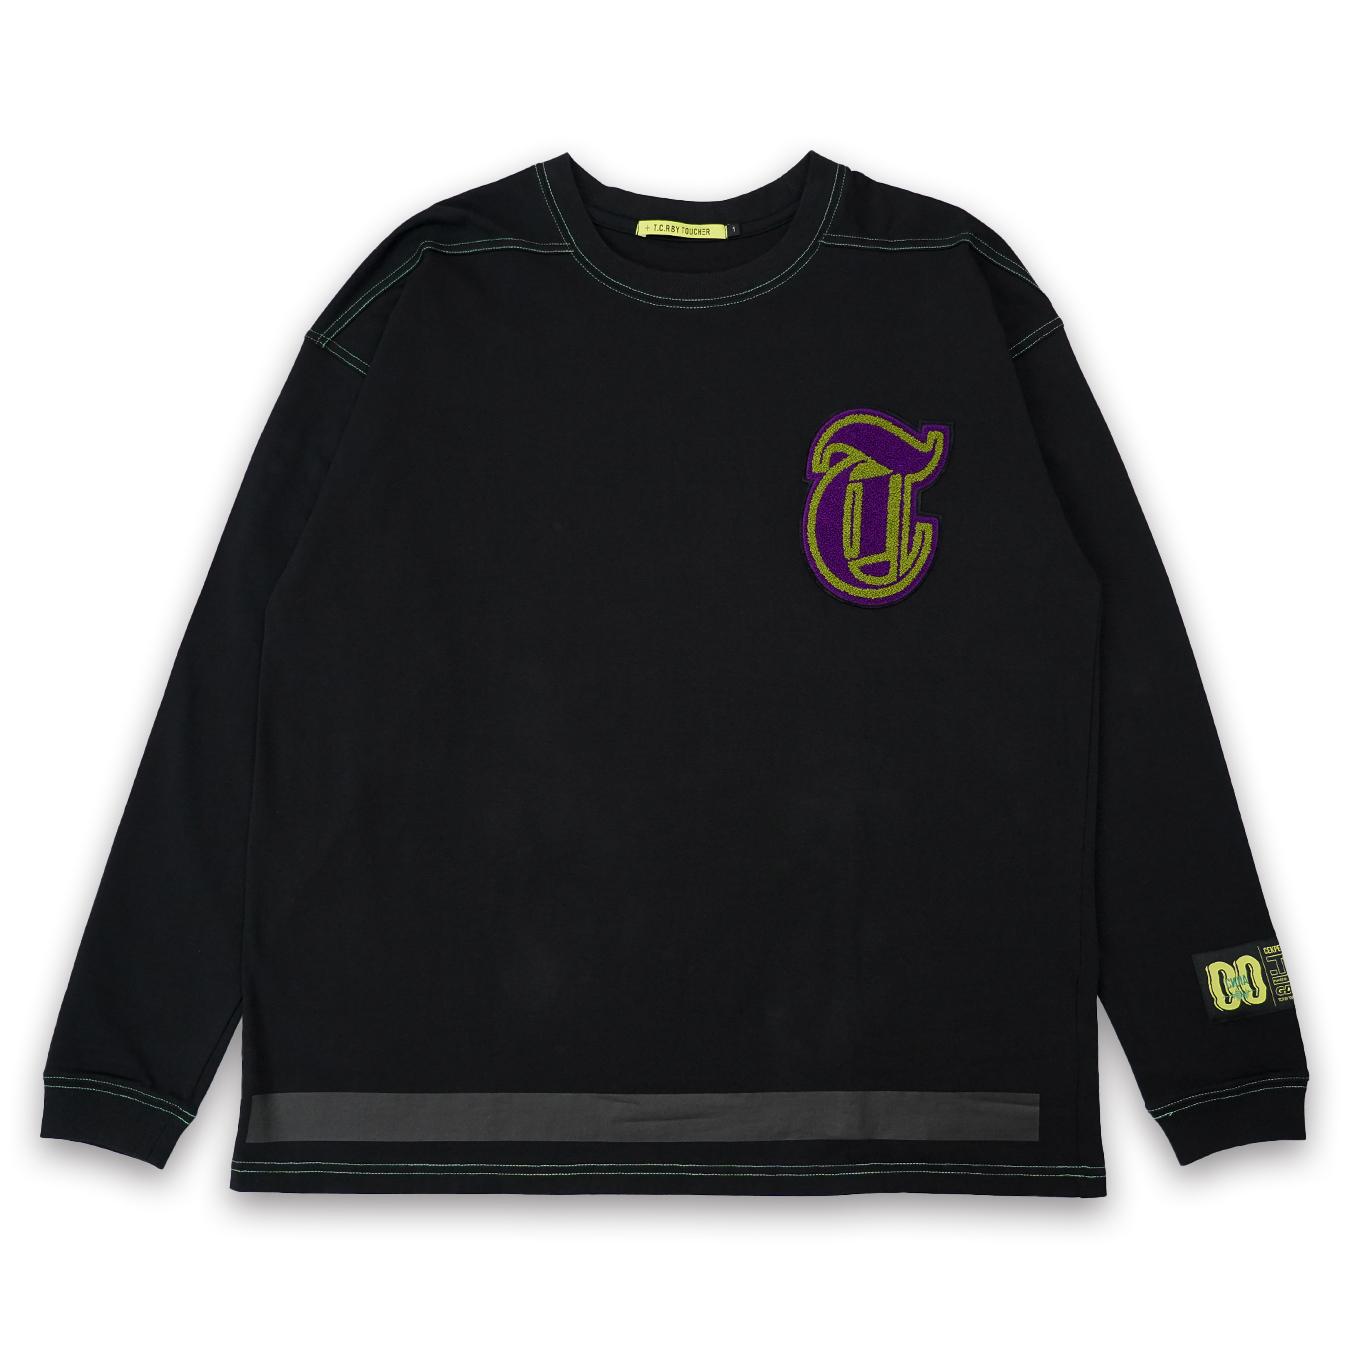 T.C.R CHENILLE LOGO L/S TEE - BLACK